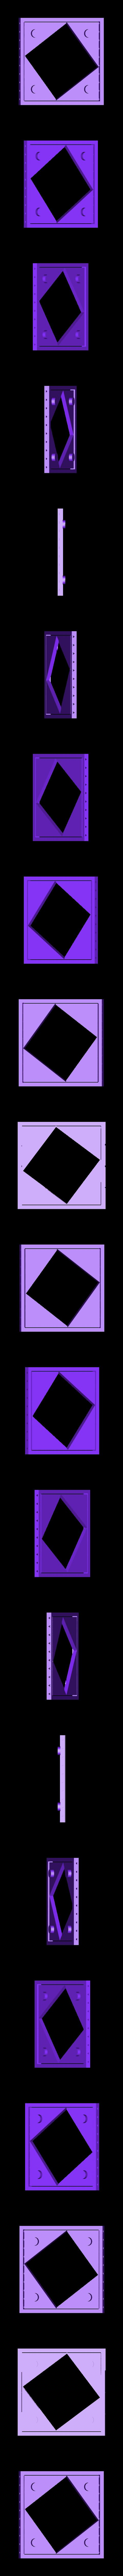 PythagoreanTheoremChinese345.stl Download free STL file Pythagorean Theorem, Visual Proof, Chinese Origin • 3D printer template, LGBU